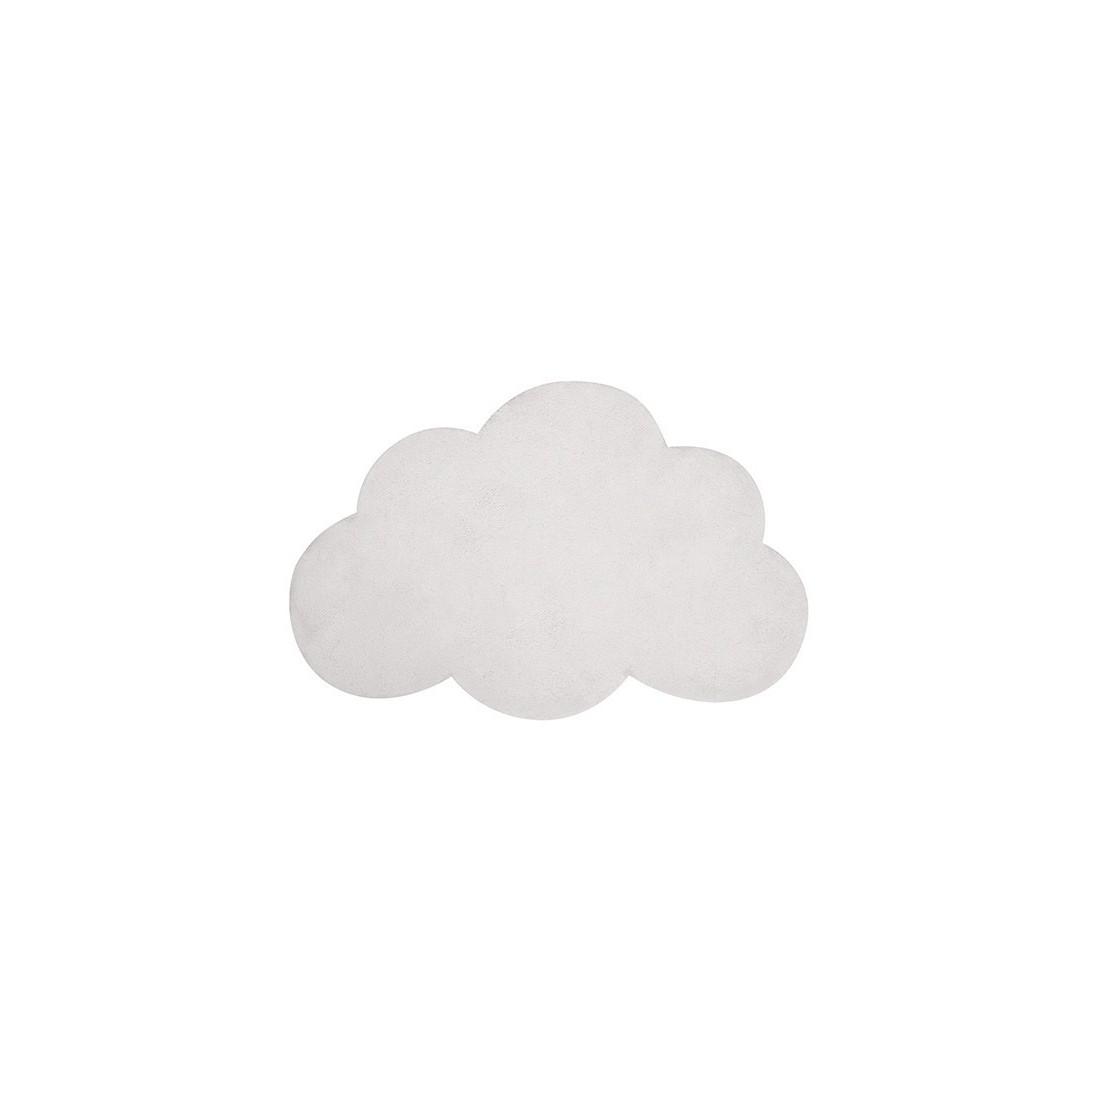 Tapis Chambre Bebe Nuage : Tapis enfant nuage blanc lilipinso ma chambramoi